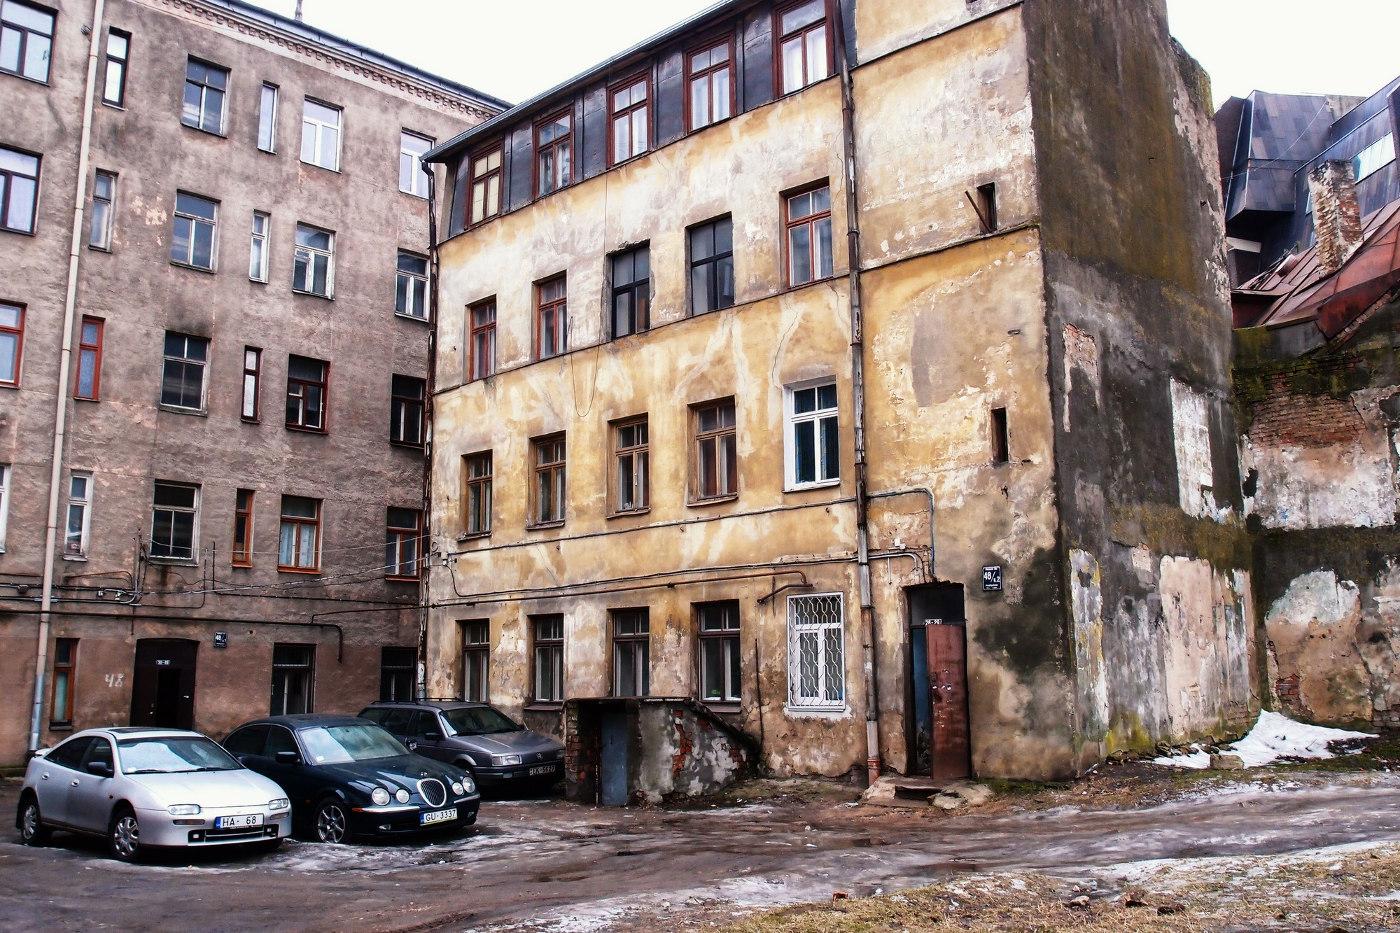 В Латвии признали отставание от других стран Прибалтики и ЕС